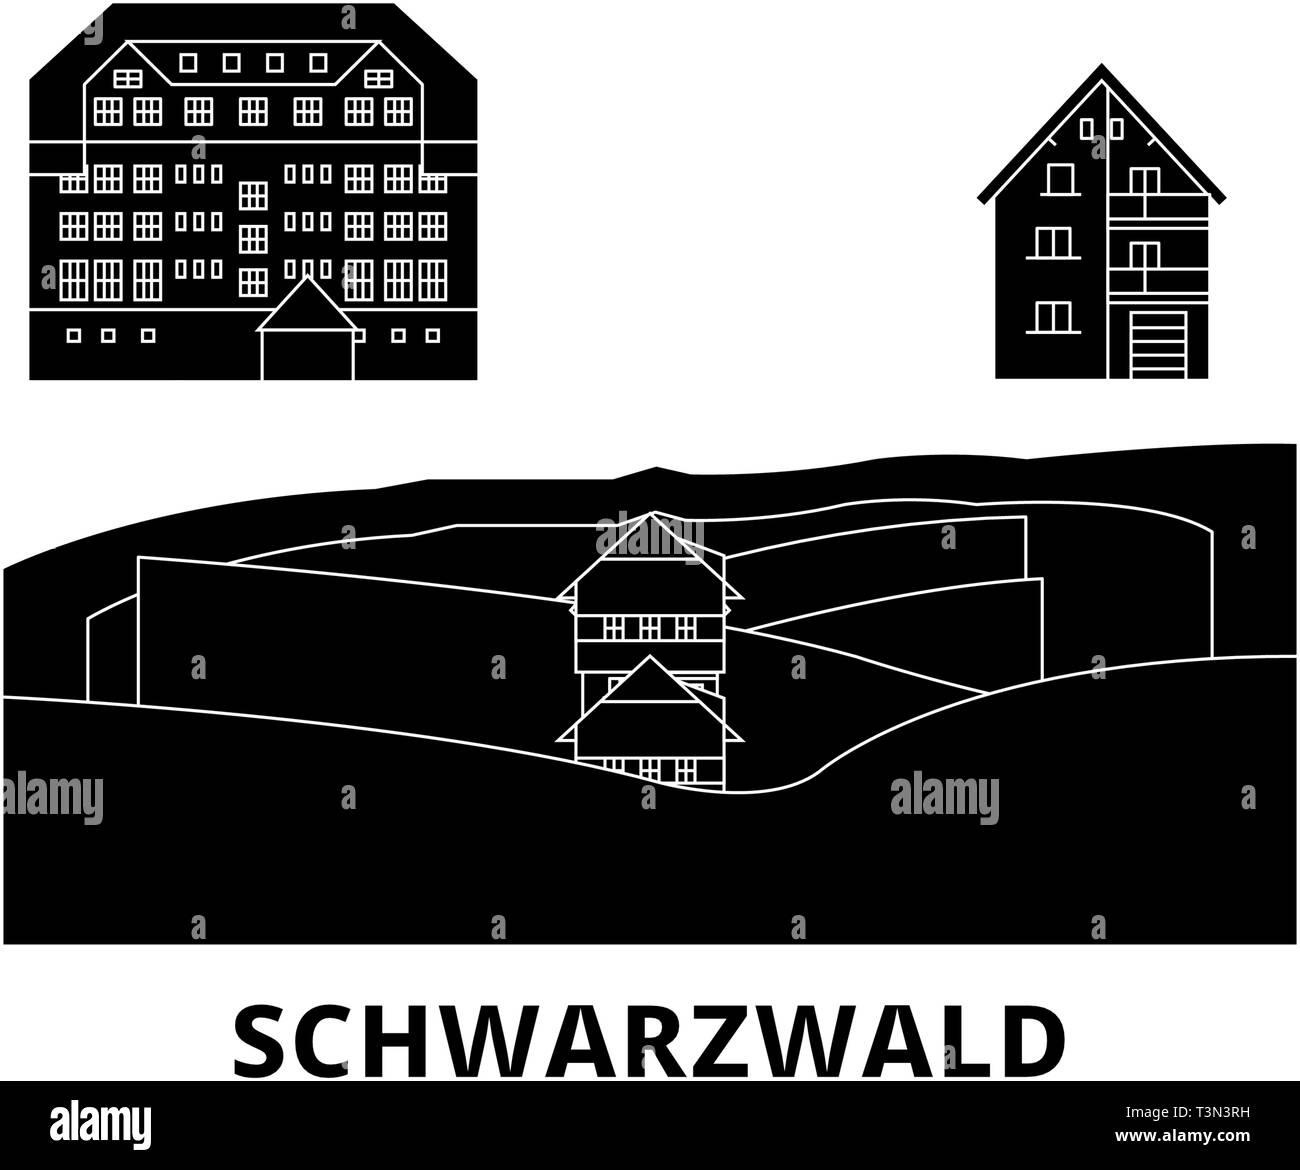 Germany, Schwarzwald flat travel skyline set. Germany, Schwarzwald black city vector illustration, symbol, travel sights, landmarks. - Stock Vector